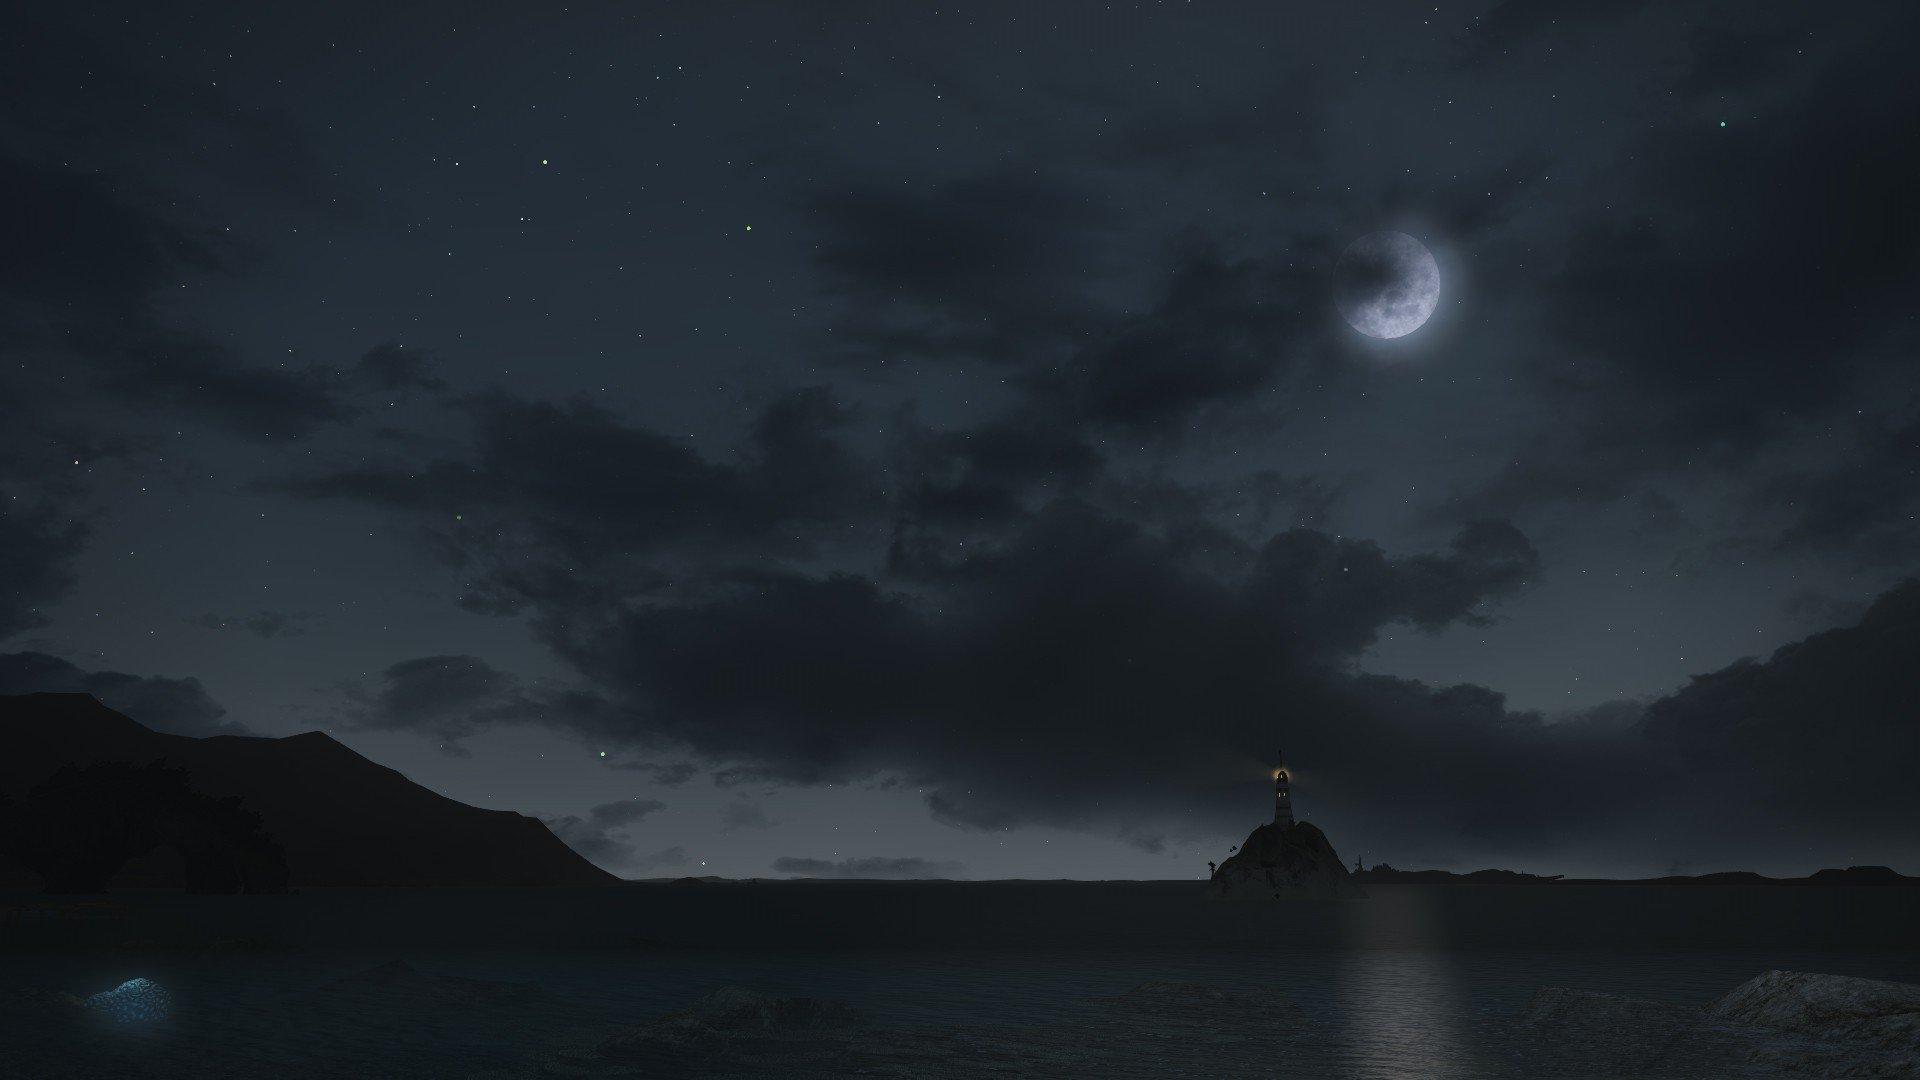 digital art, Minimalism, Landscape, Lighthouse, Night, Moon, Clouds, Sea, Cliff, Rock, Stars, Reflection Wallpaper